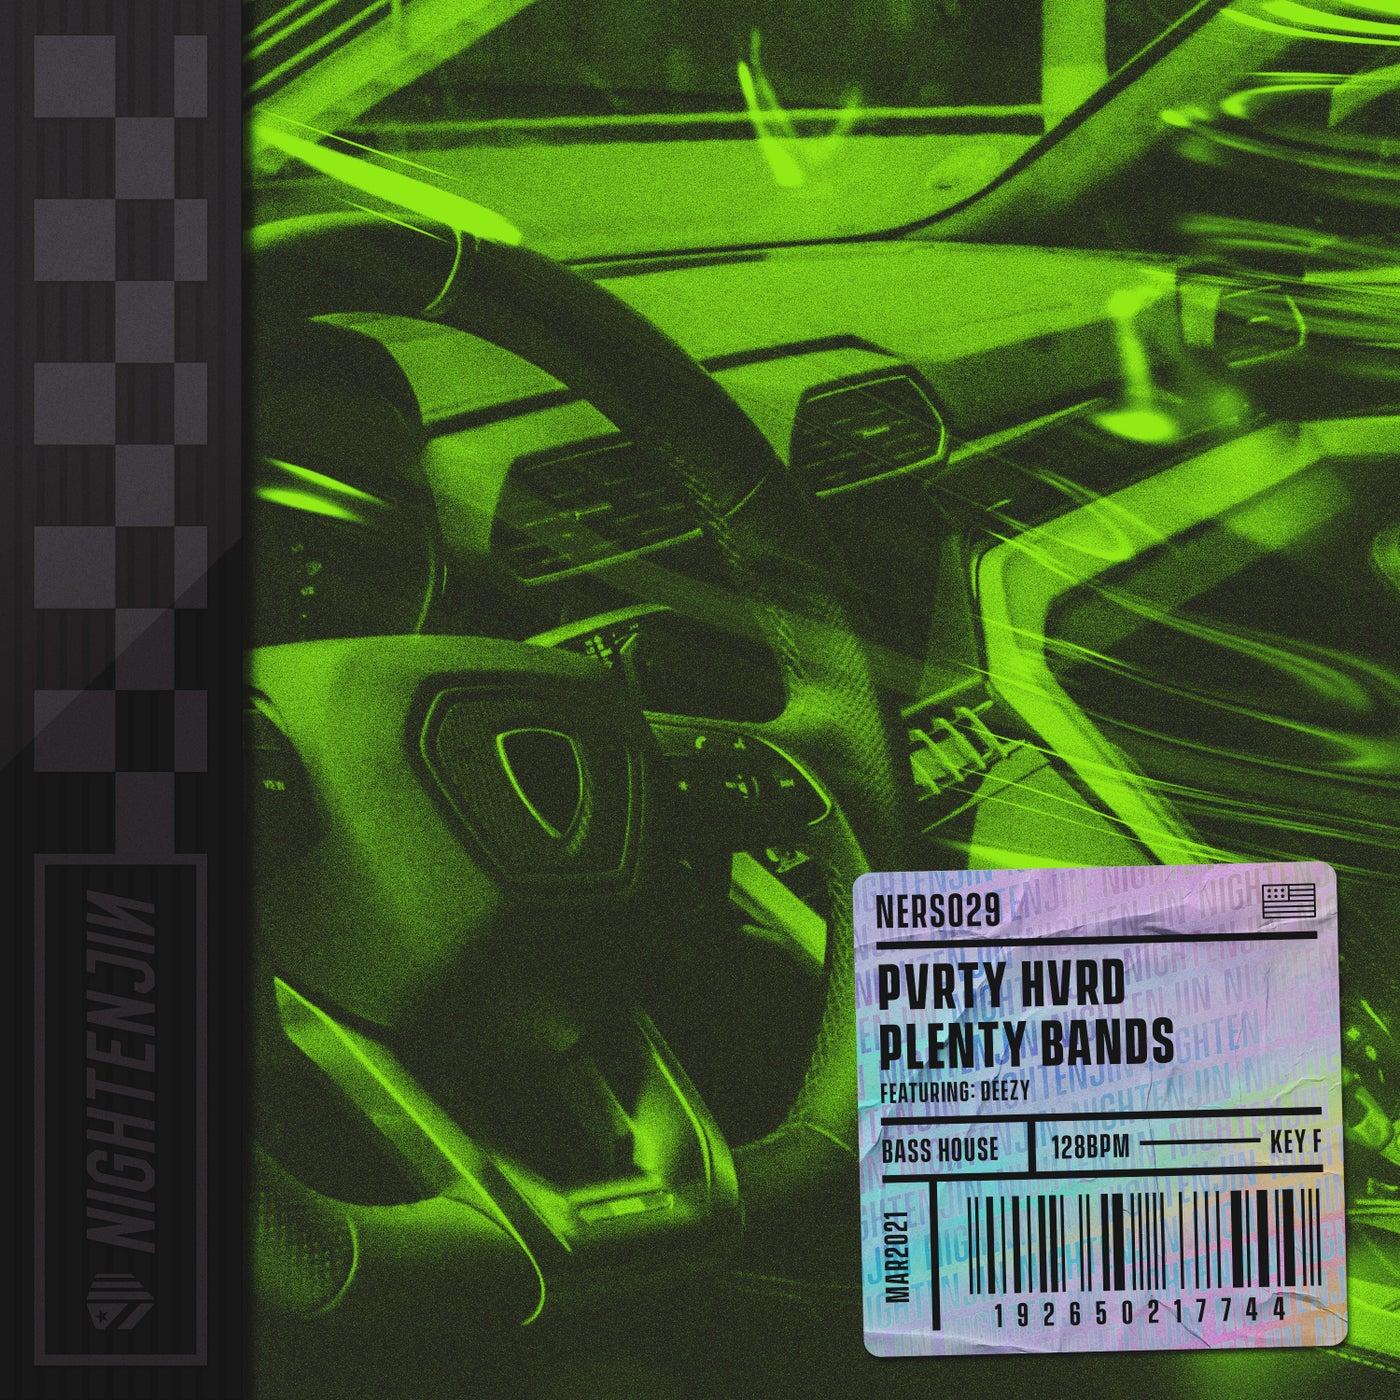 Plenty Bands (feat. Deezy) (Original Mix)